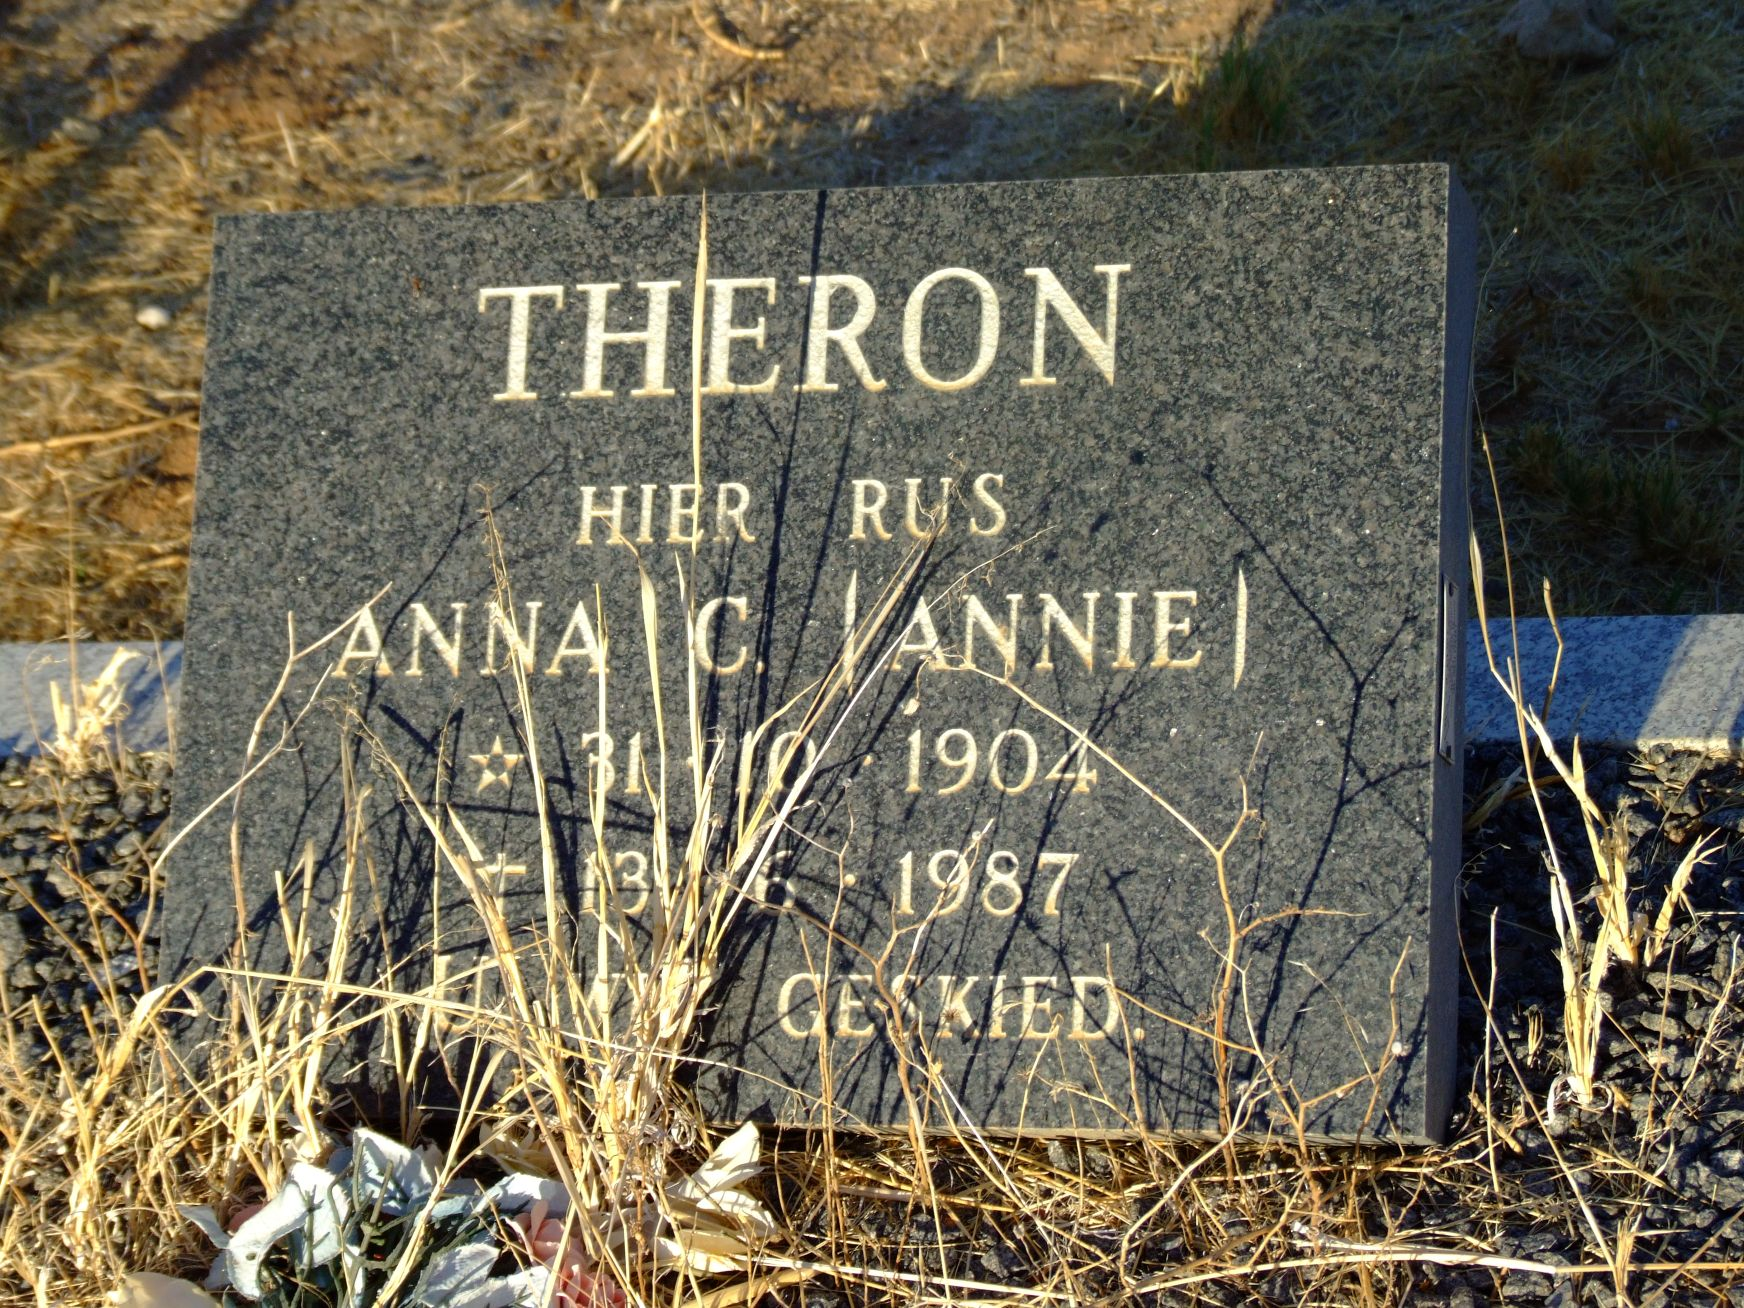 Theron, Anna C